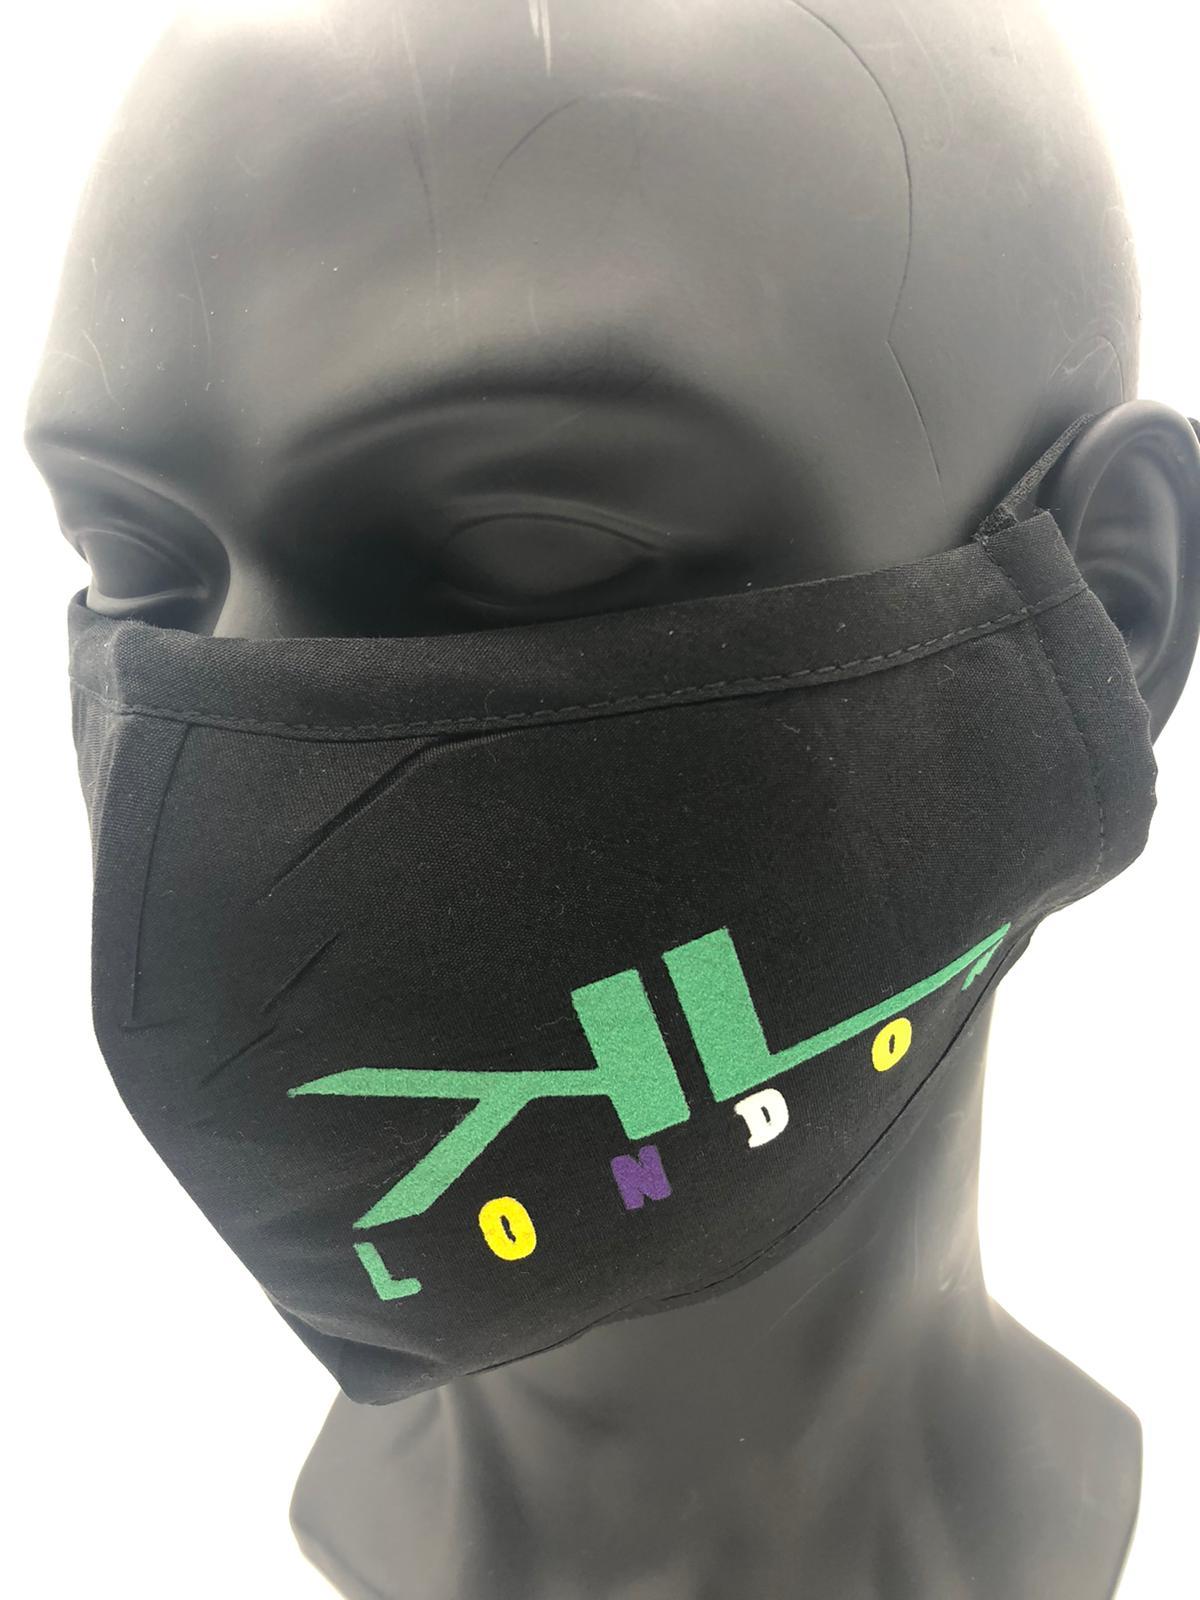 K-live Entertaimnet Mask